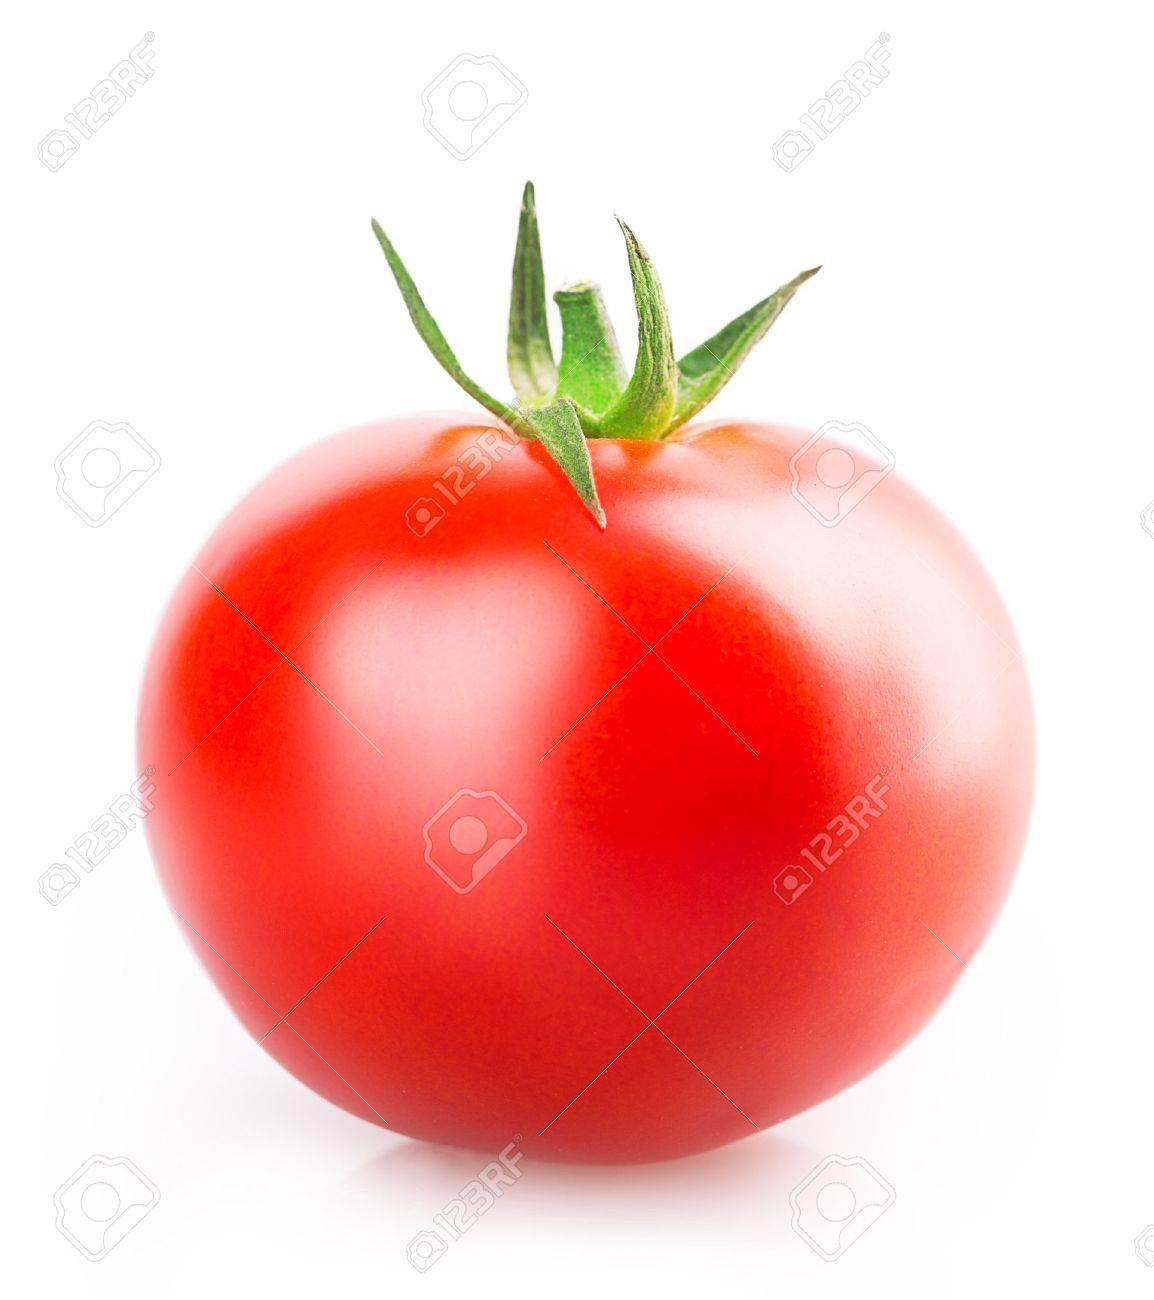 tomato Isolated on white background Standard-Bild - 36795261